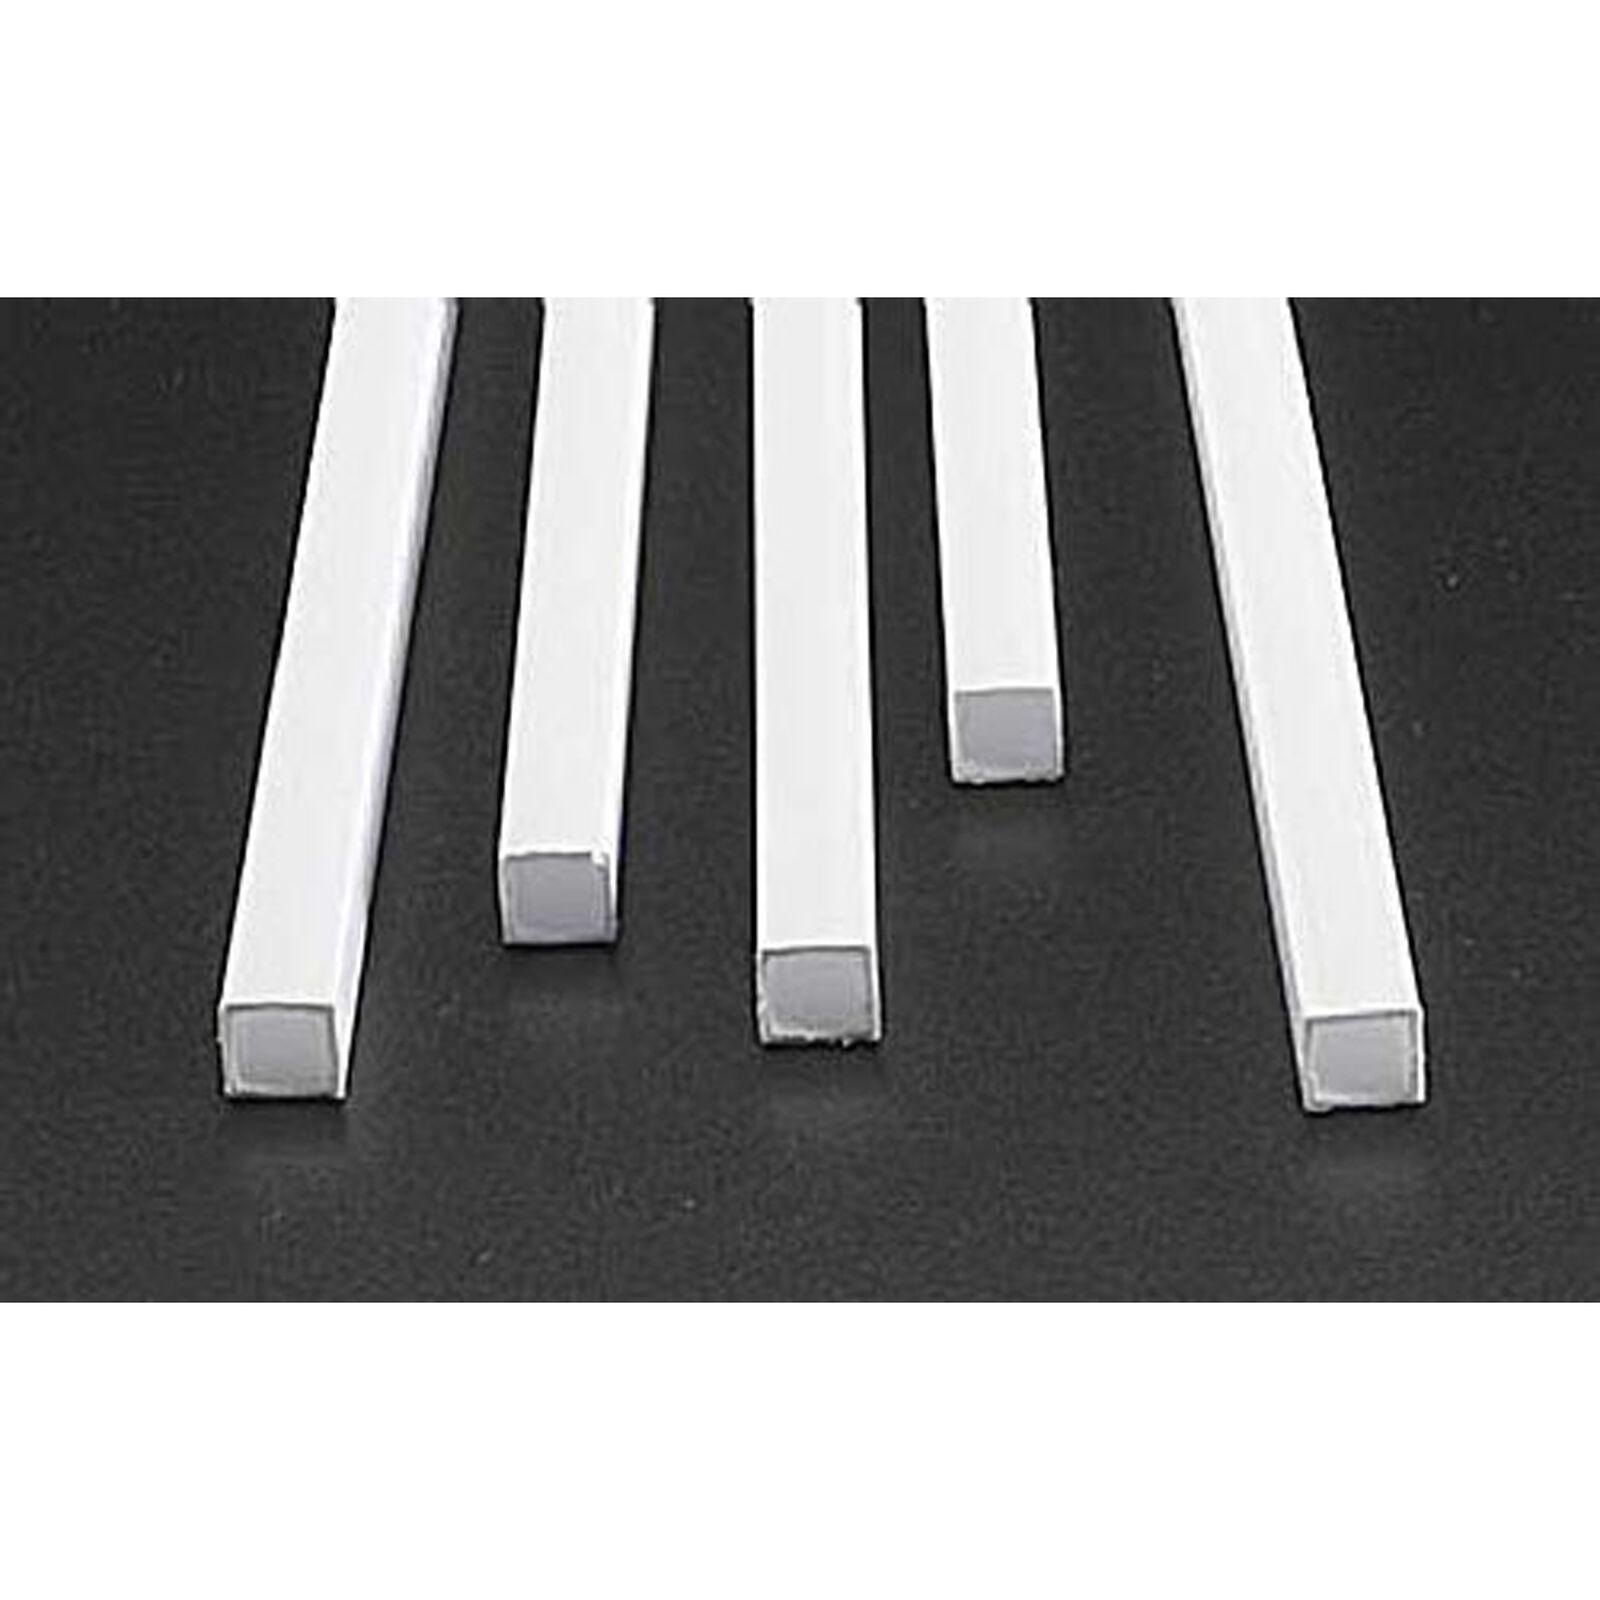 "STFS-10 Square Tubing 5/16""(5)"